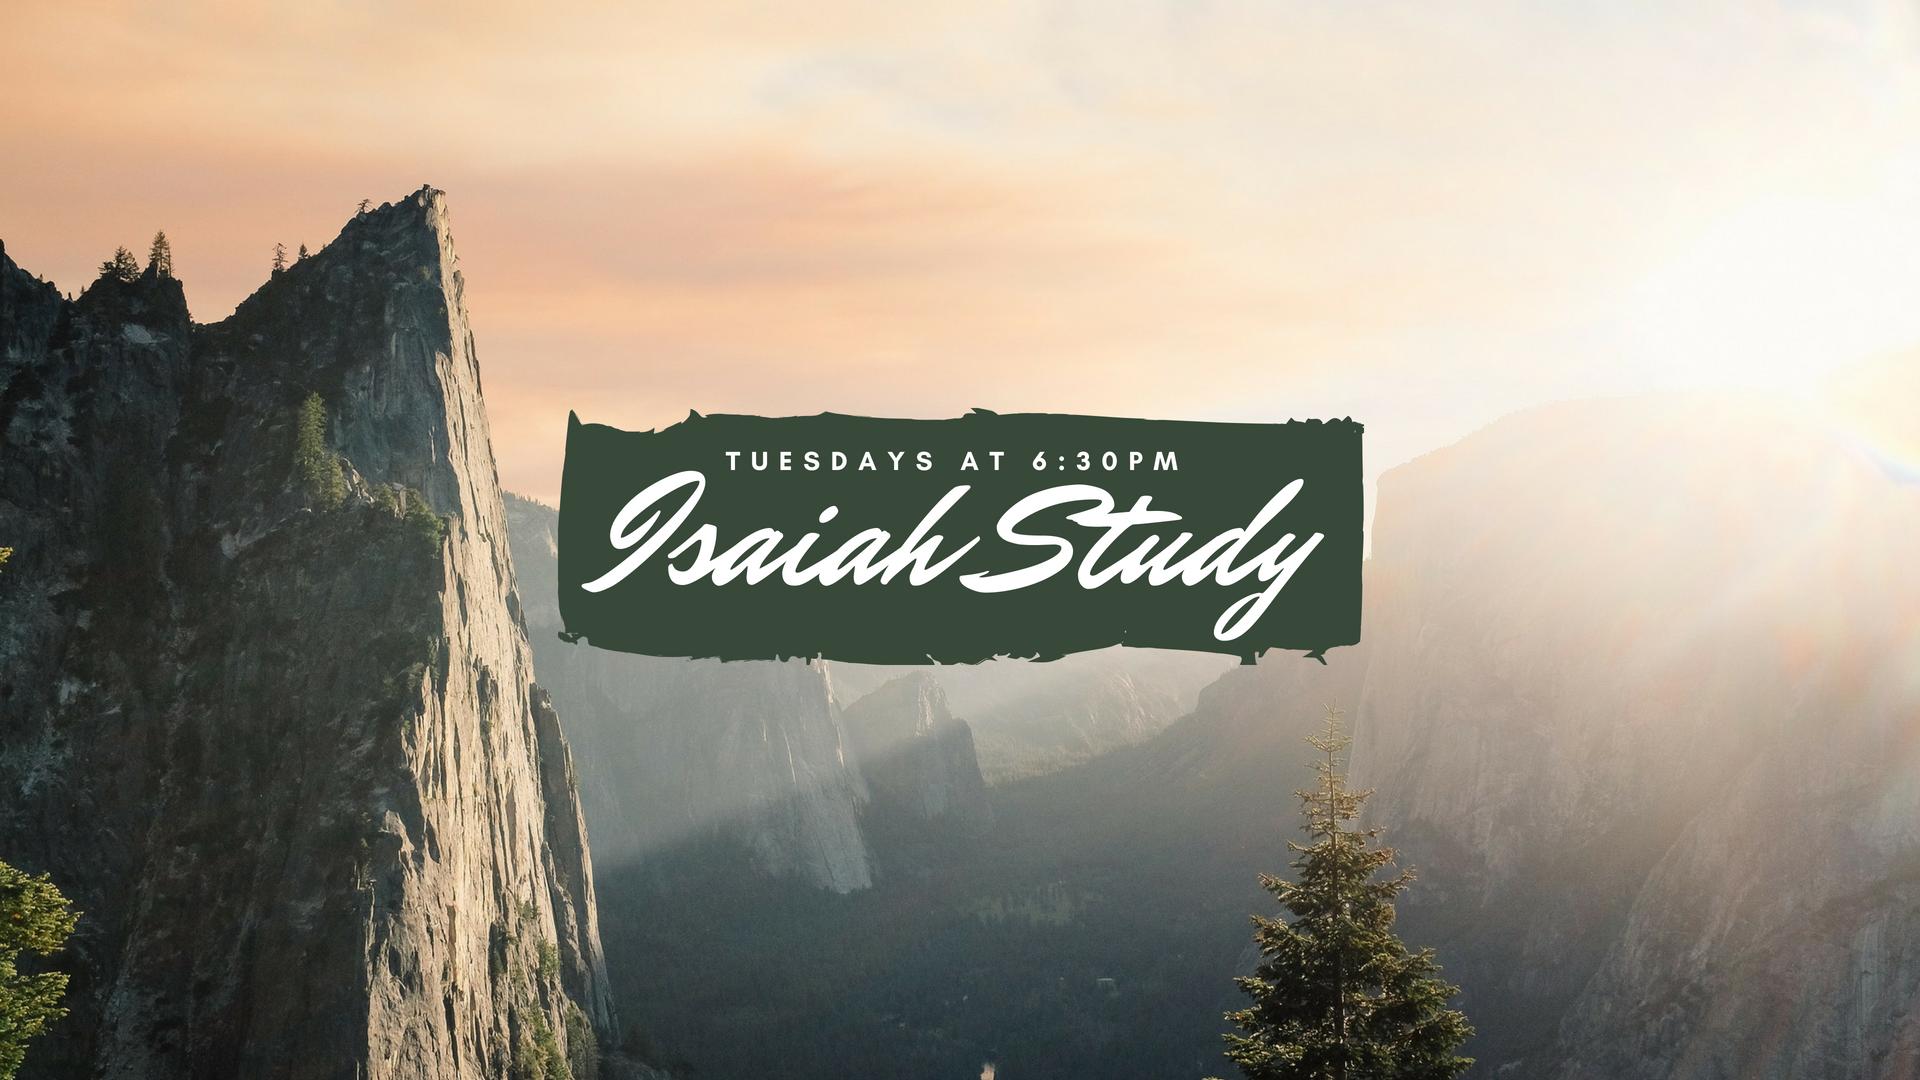 IsaiahStudy.png